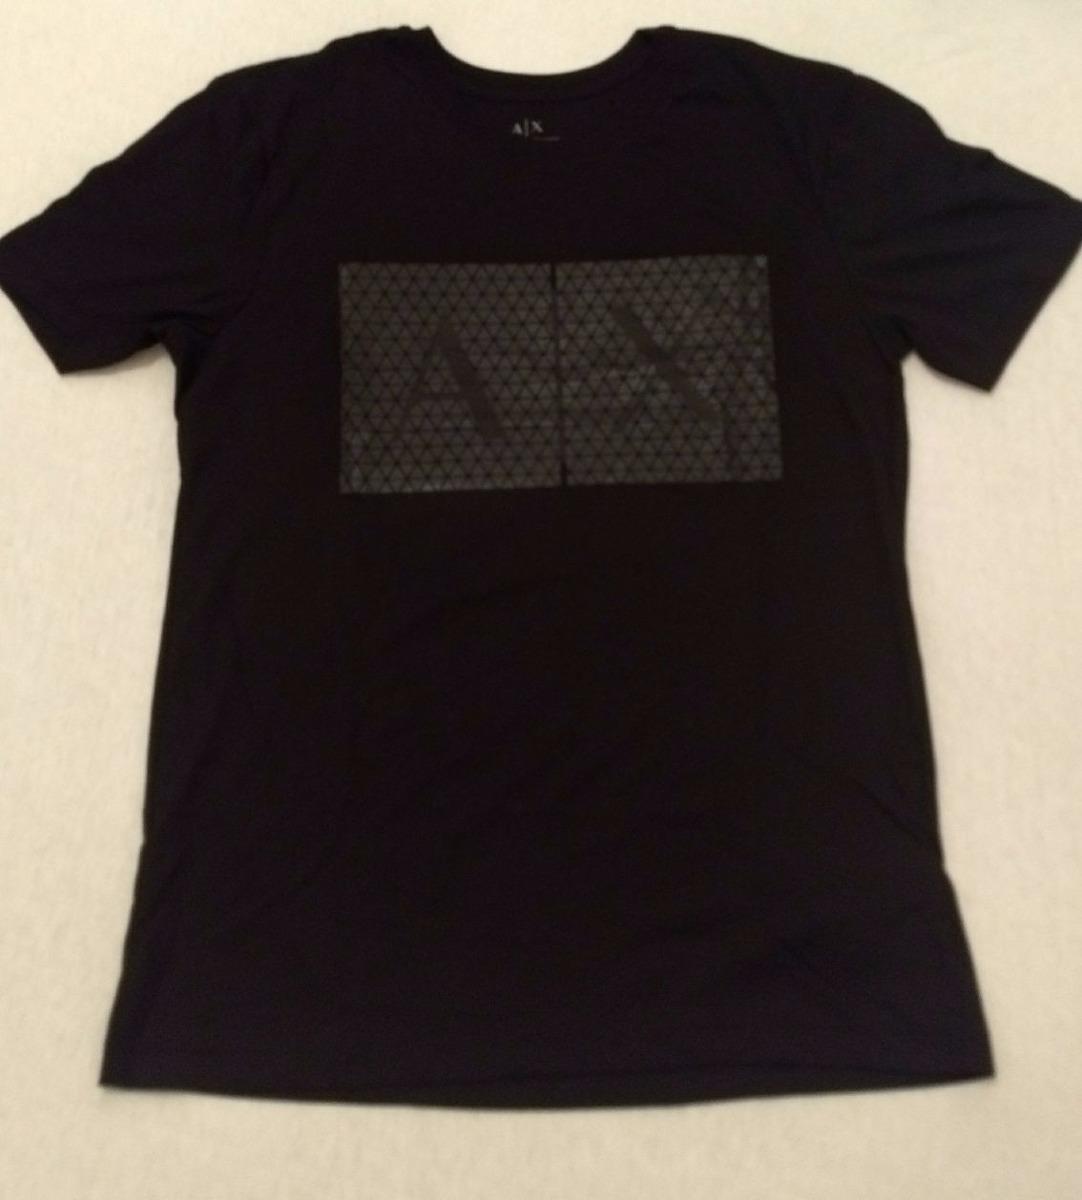 747f9d75654 camiseta armani exchange pima cotton  1204. Carregando zoom.